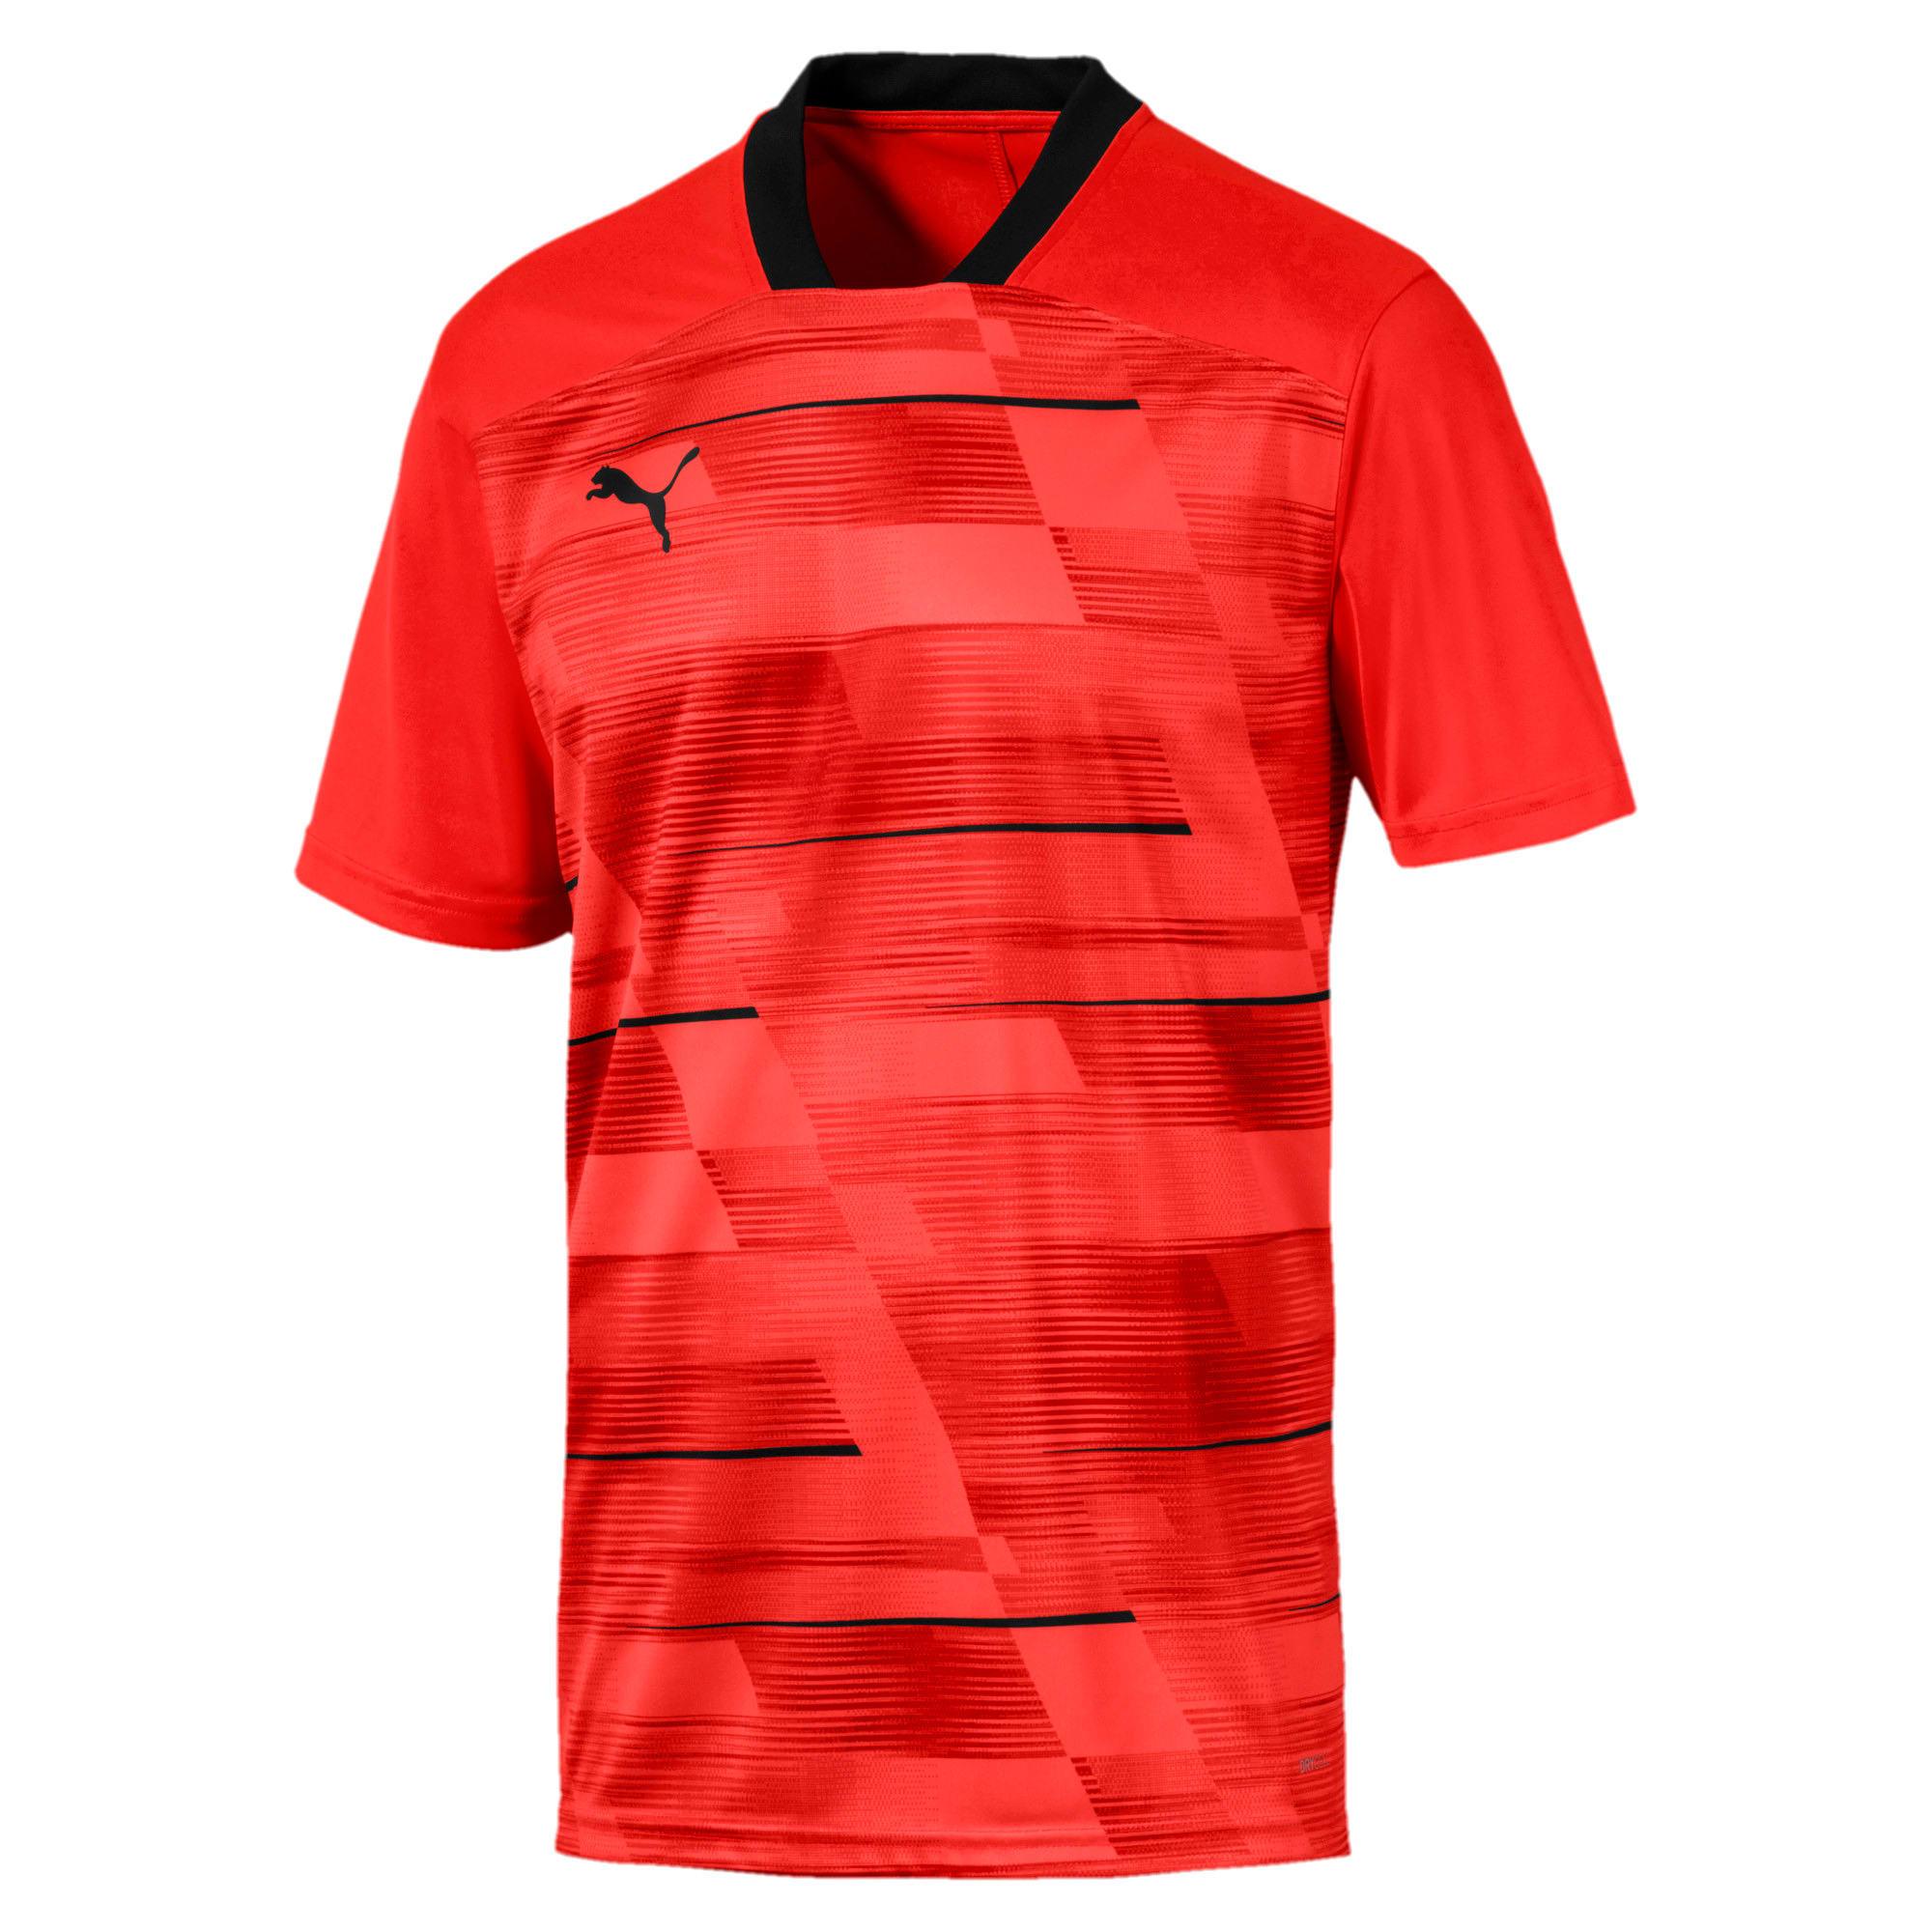 Thumbnail 4 of ftblNXT Men's Graphic Shirt, Nrgy Red-Puma Black, medium